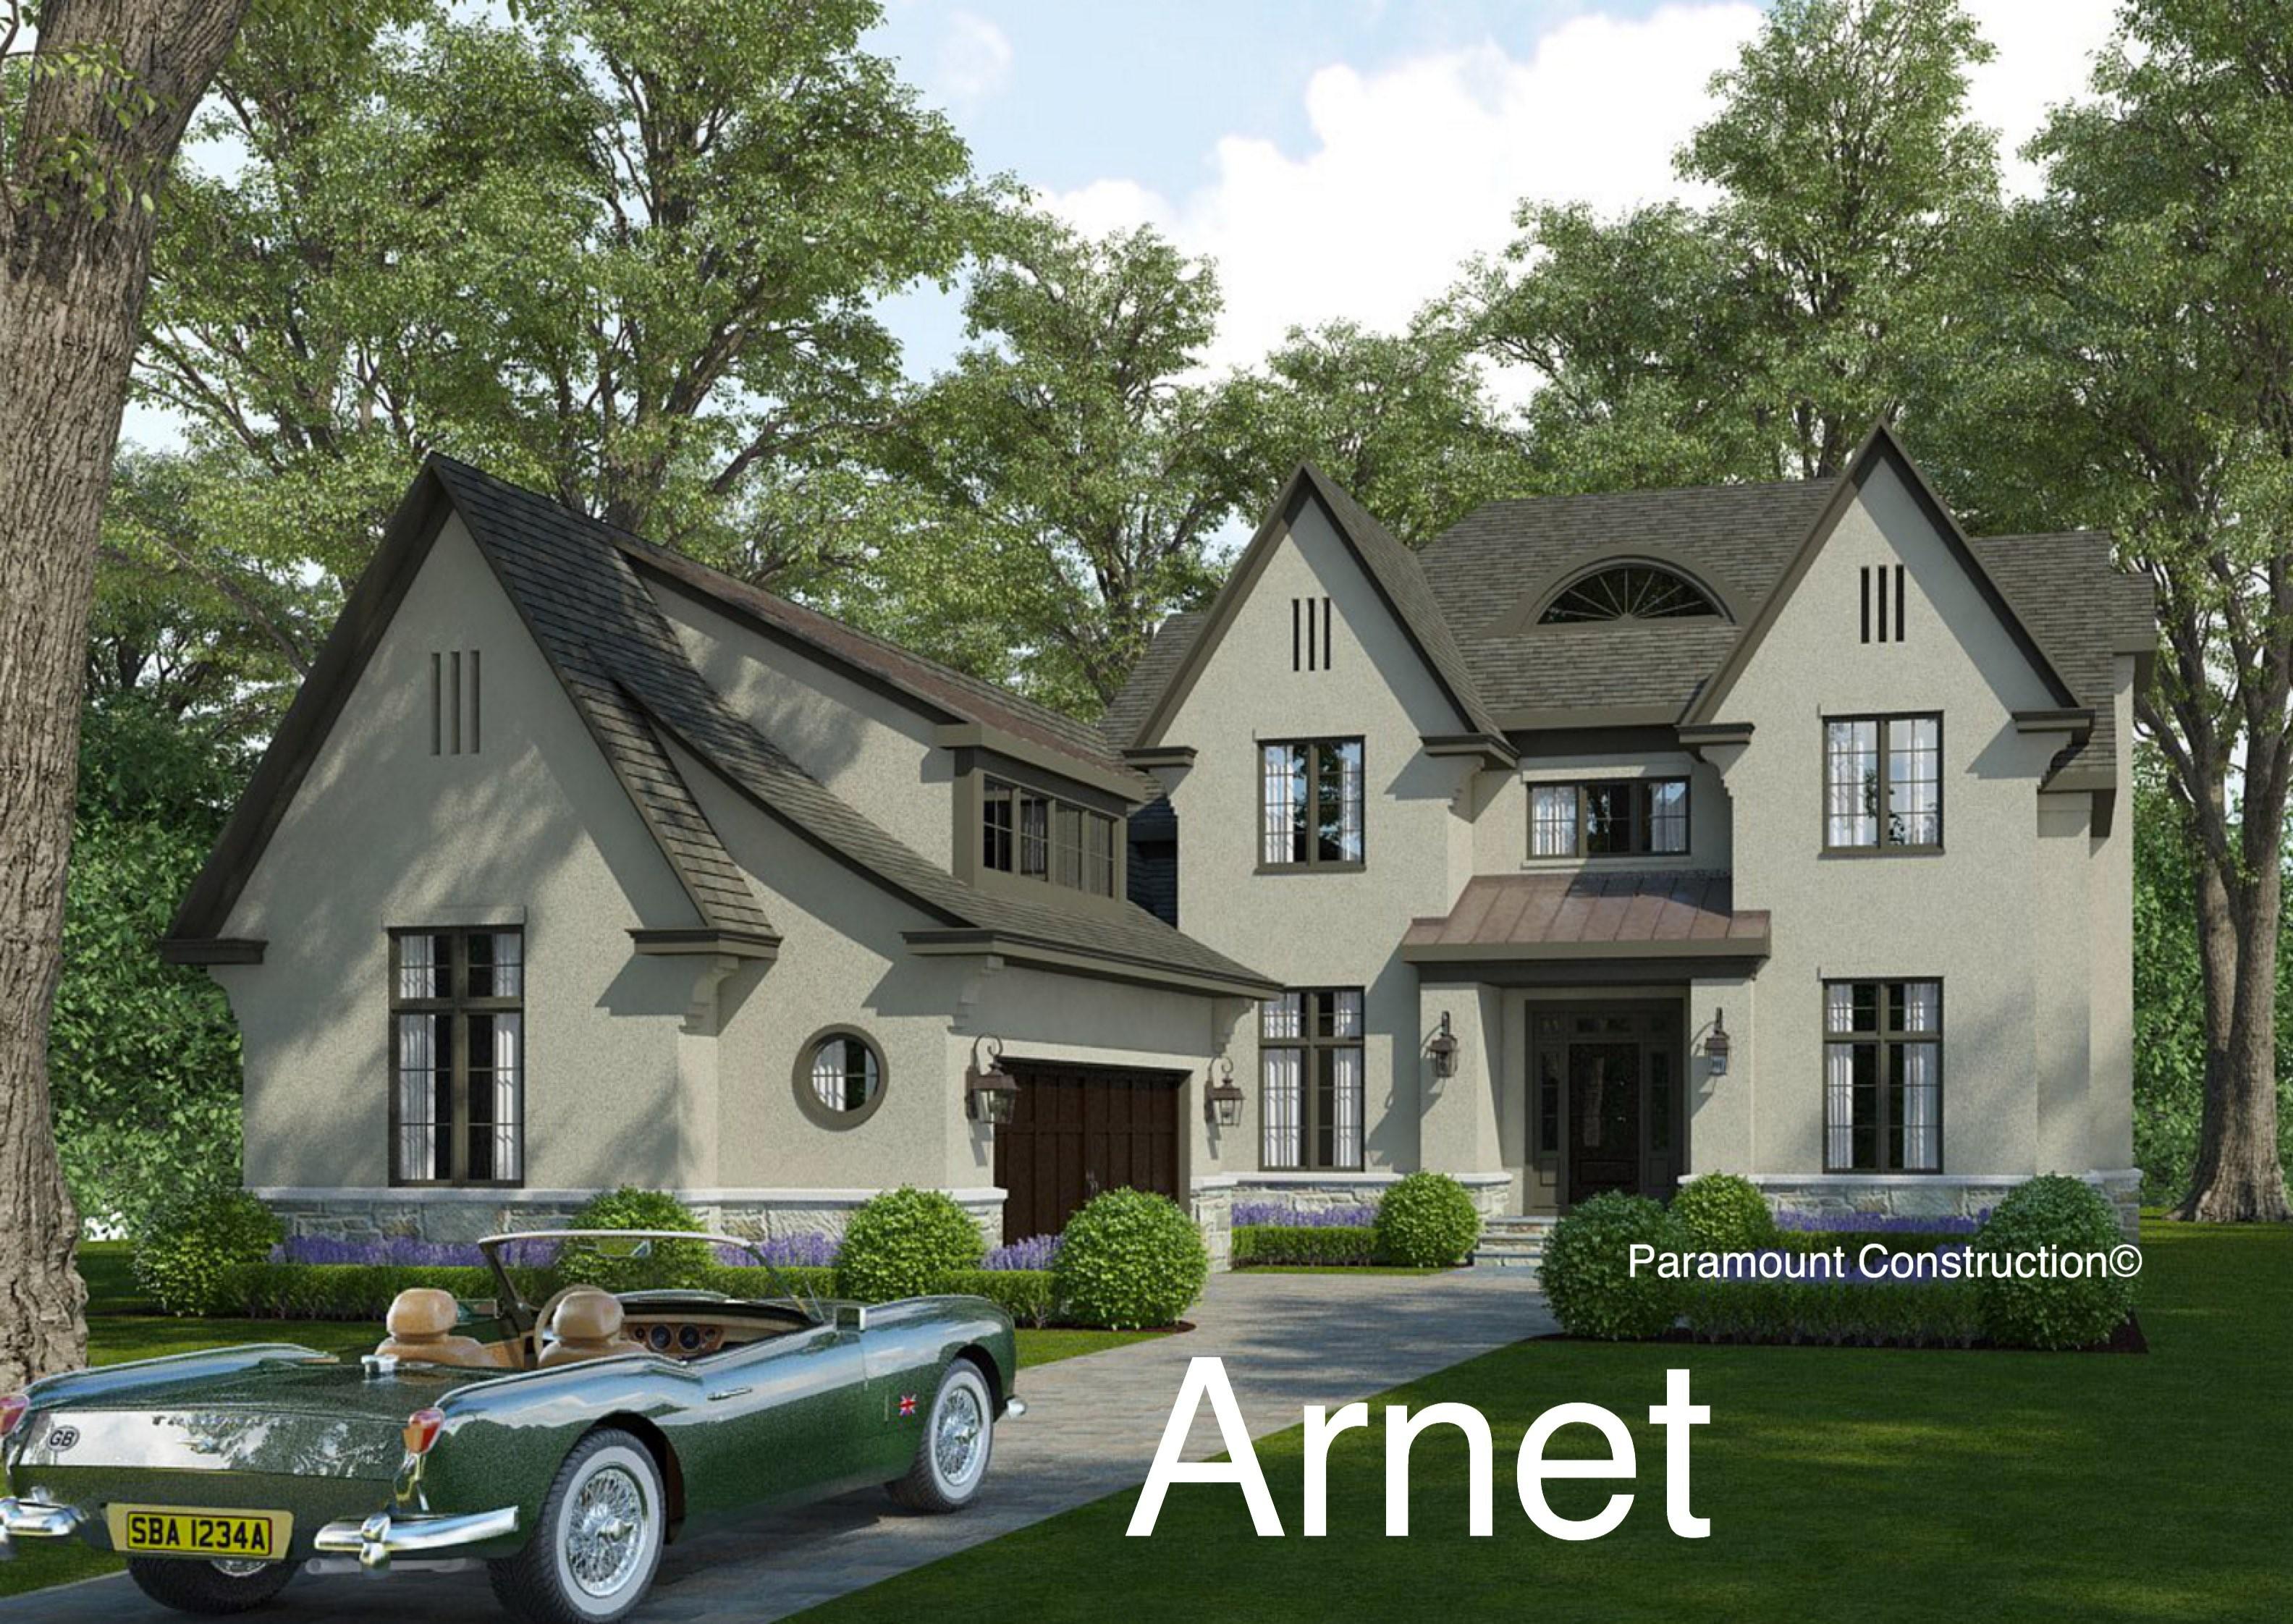 Arnet-220170317121054